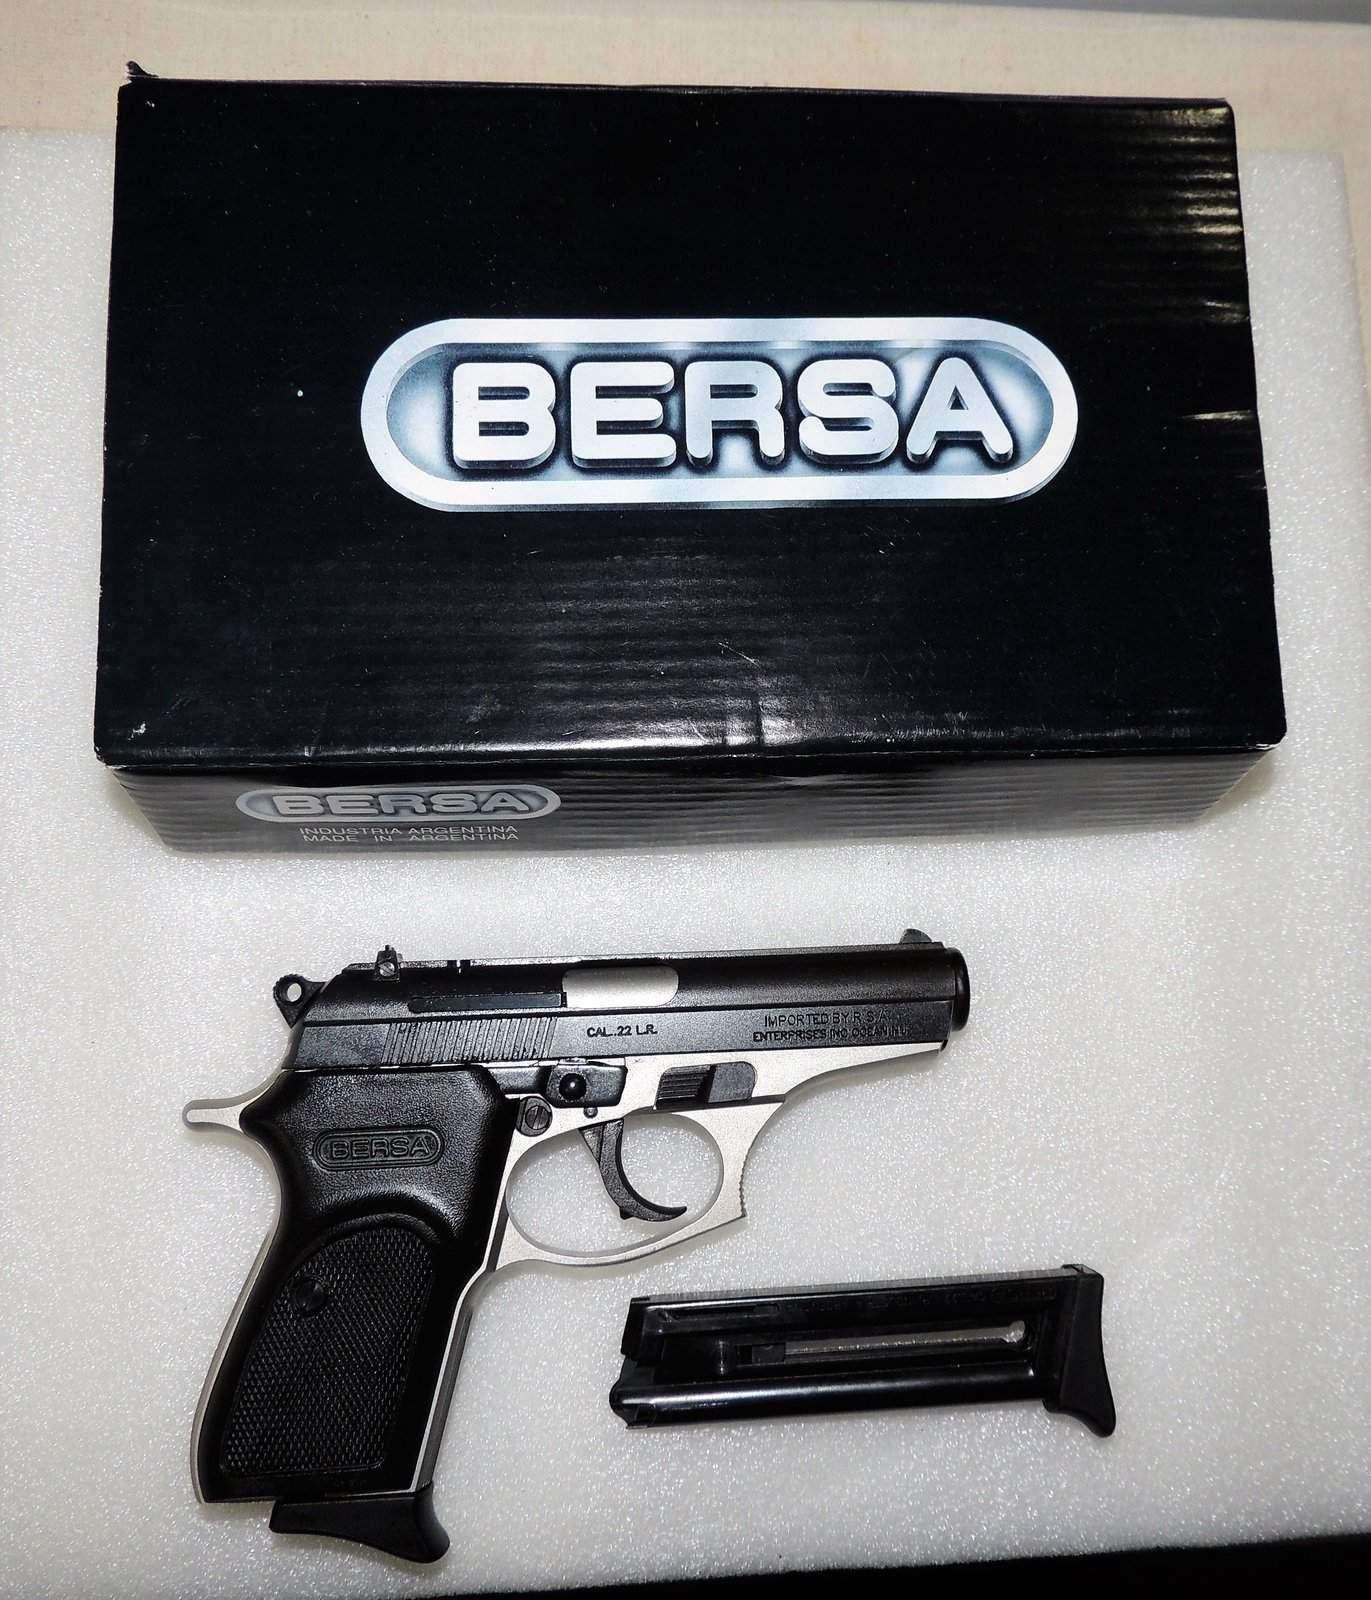 WTS WA - Bersa Thunder 22, with 2 mags and original box $200